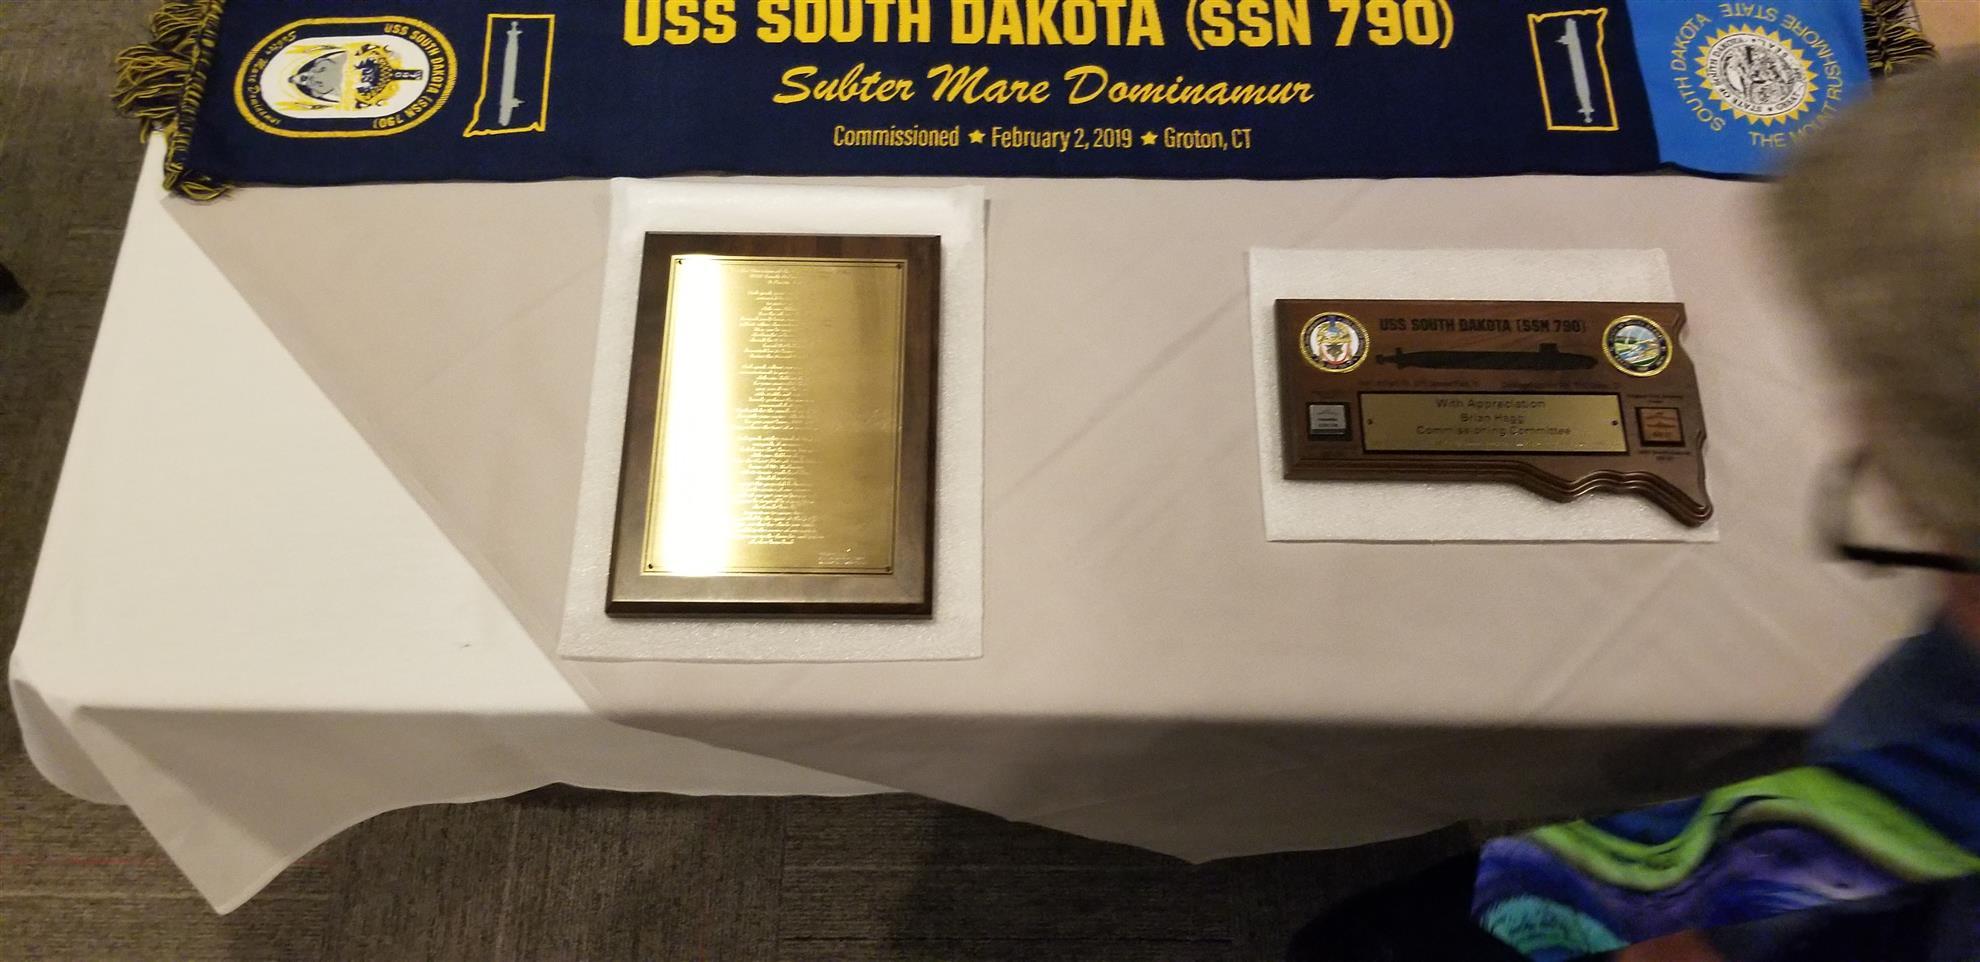 USS South Dakota Commemorative Poem & Plaque